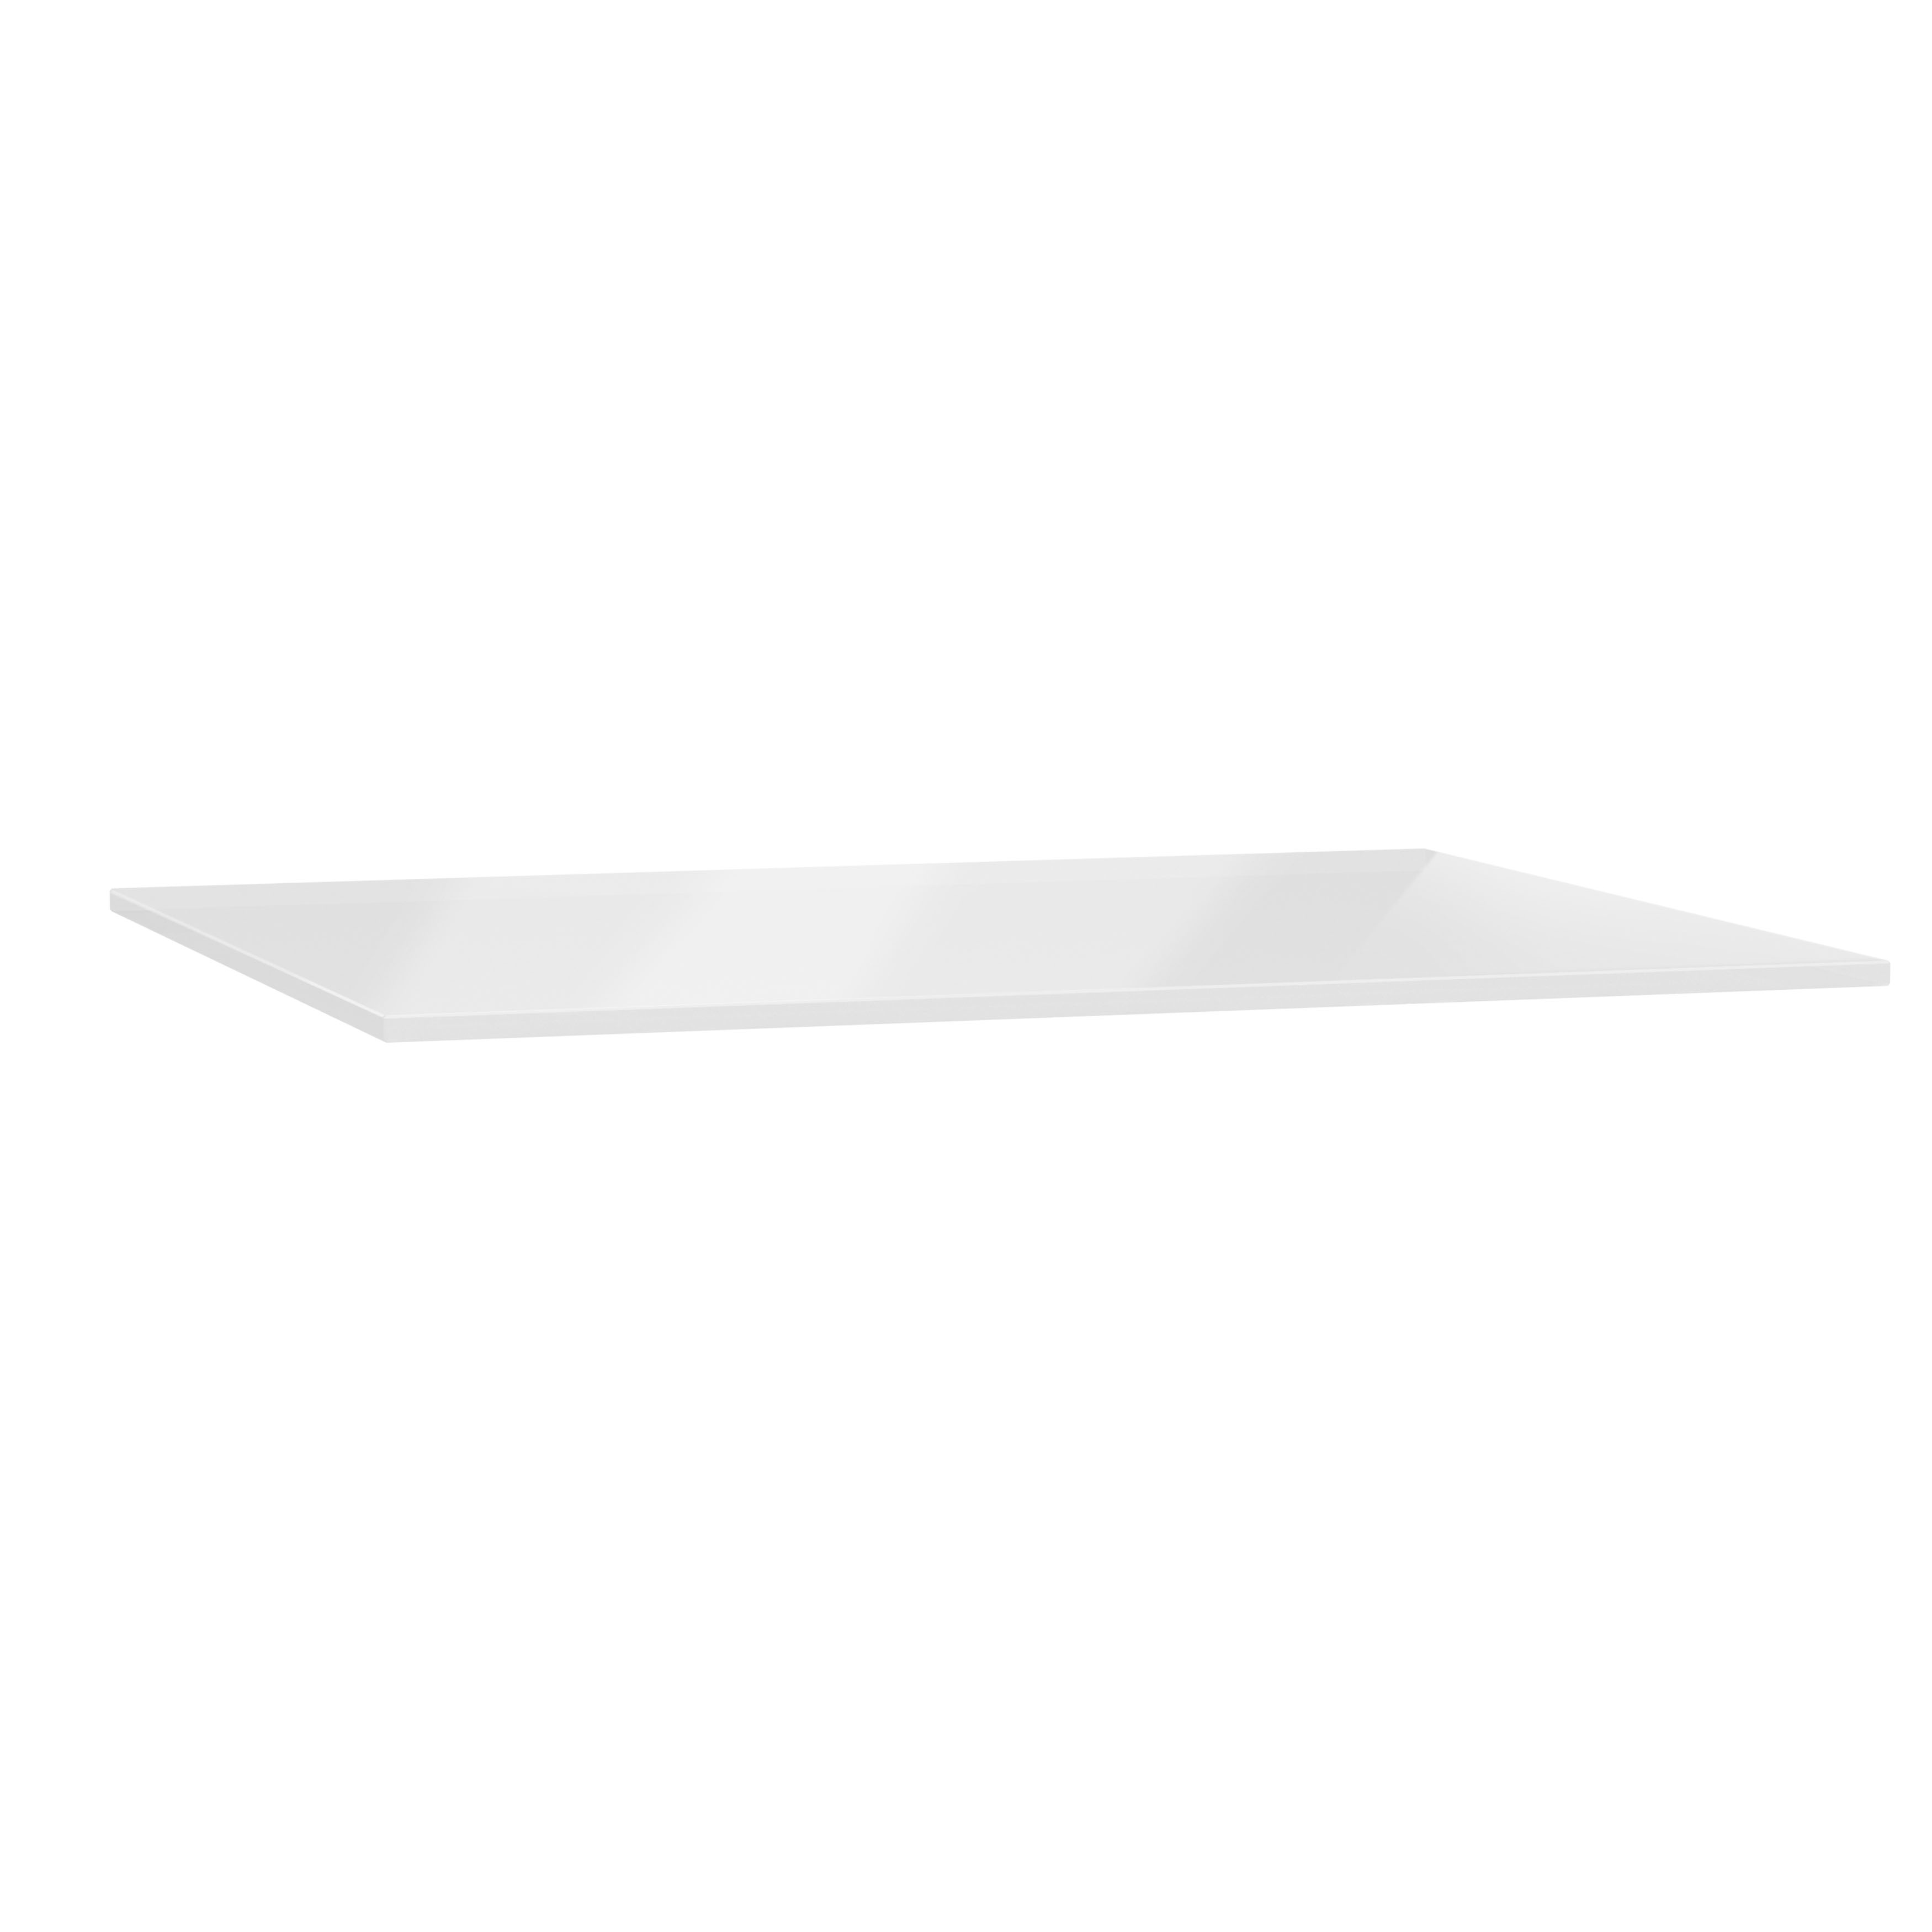 Origin plan de toilette, 150 cm, verre blanc